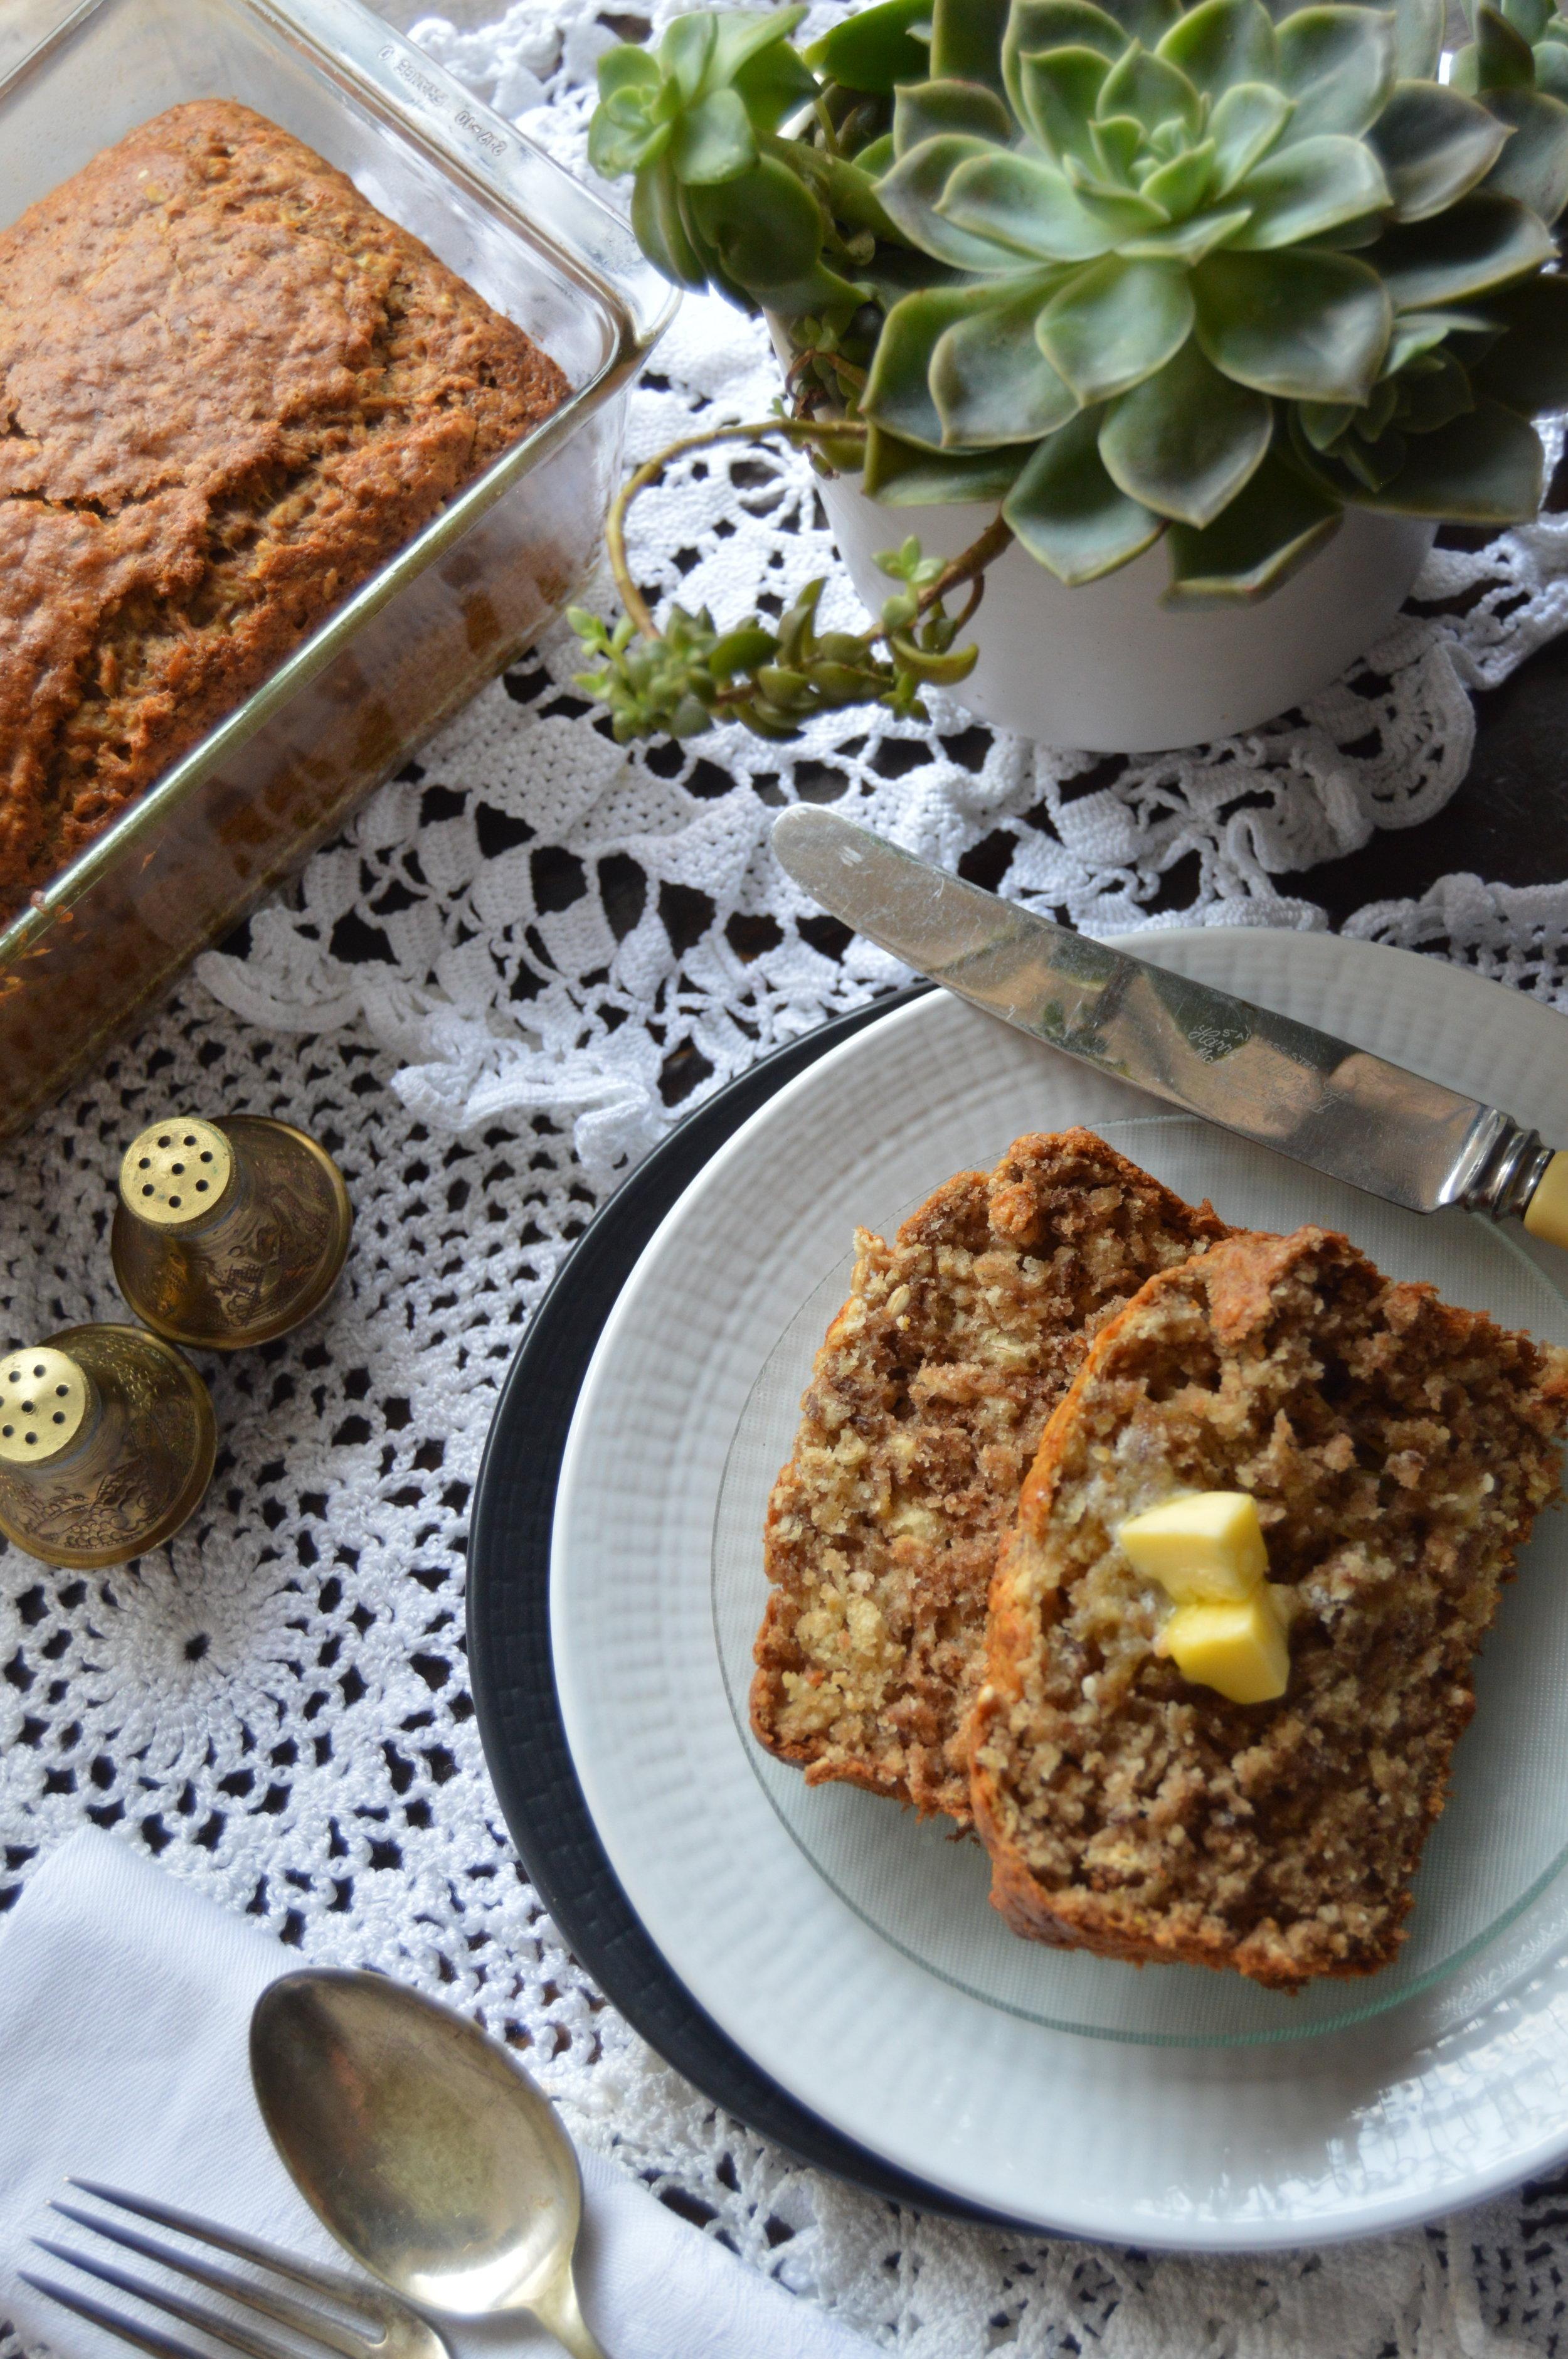 Recipes, Banana bread, GAPS Paleo LCHF, A life lead simply, www.alifeleadsimply (30).JPG